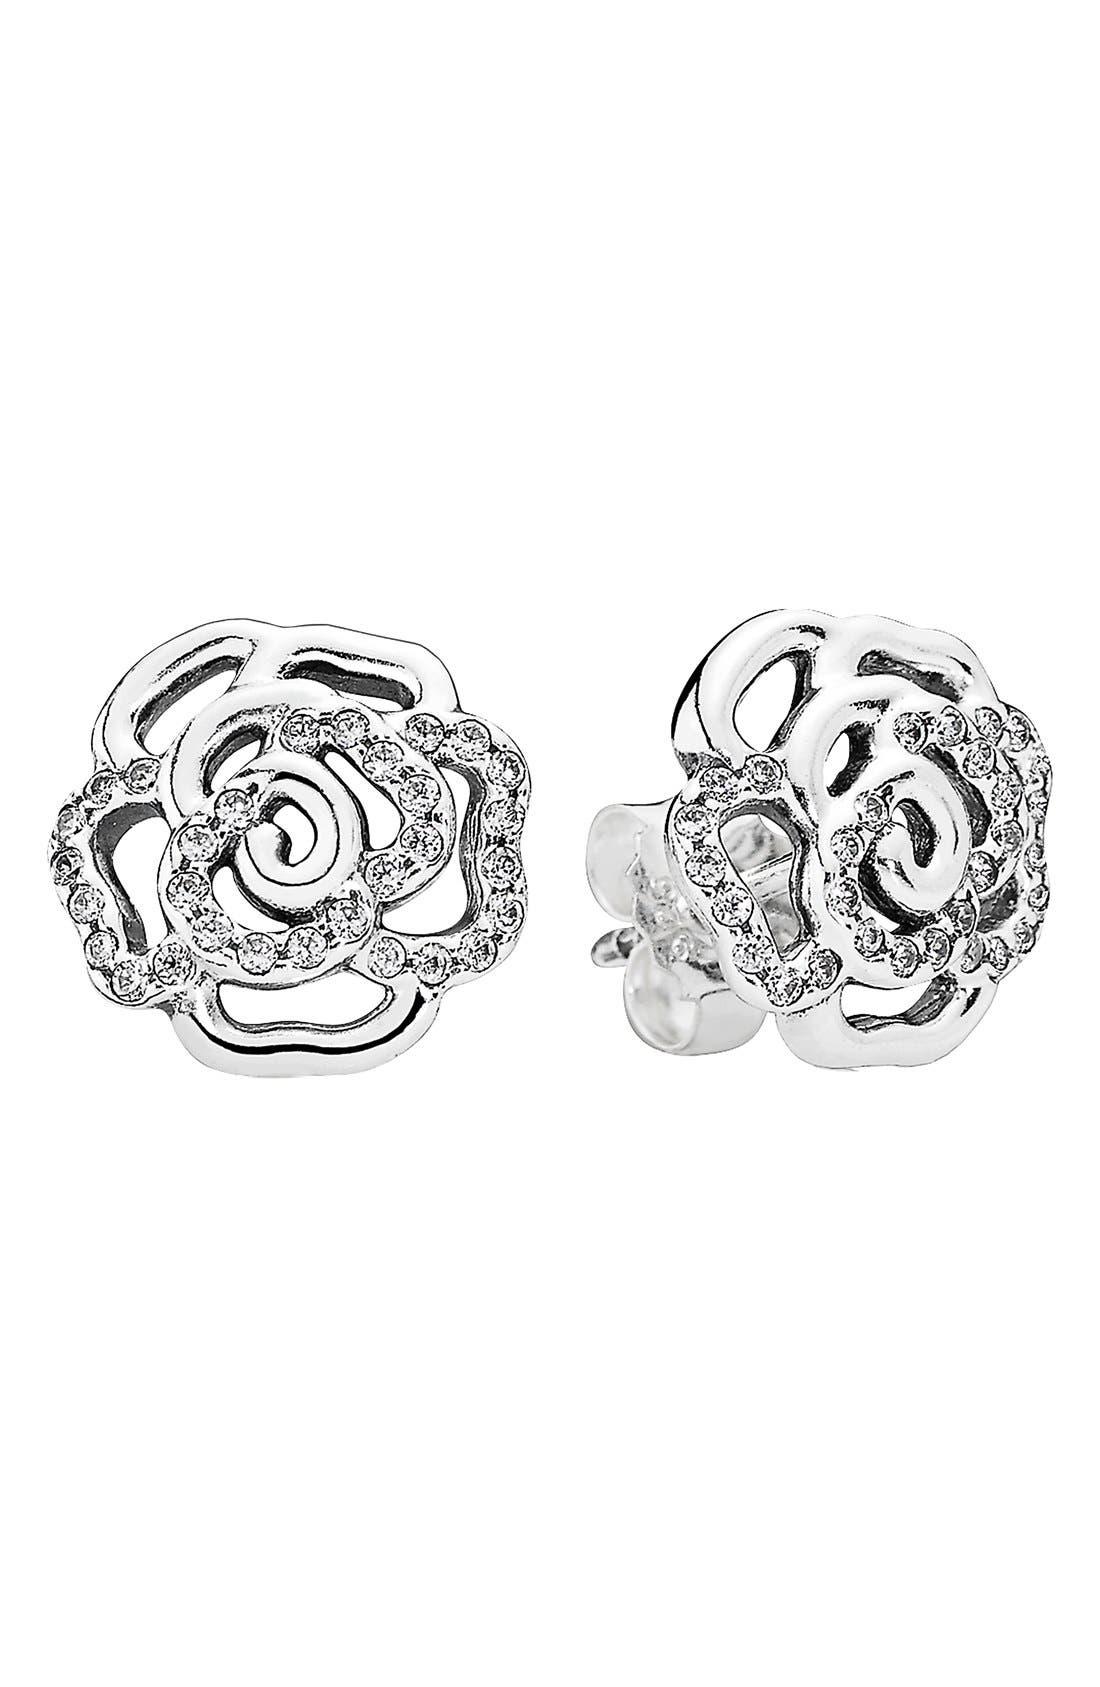 Alternate Image 1 Selected - PANDORA 'Shimmering Rose' Stud Earrings